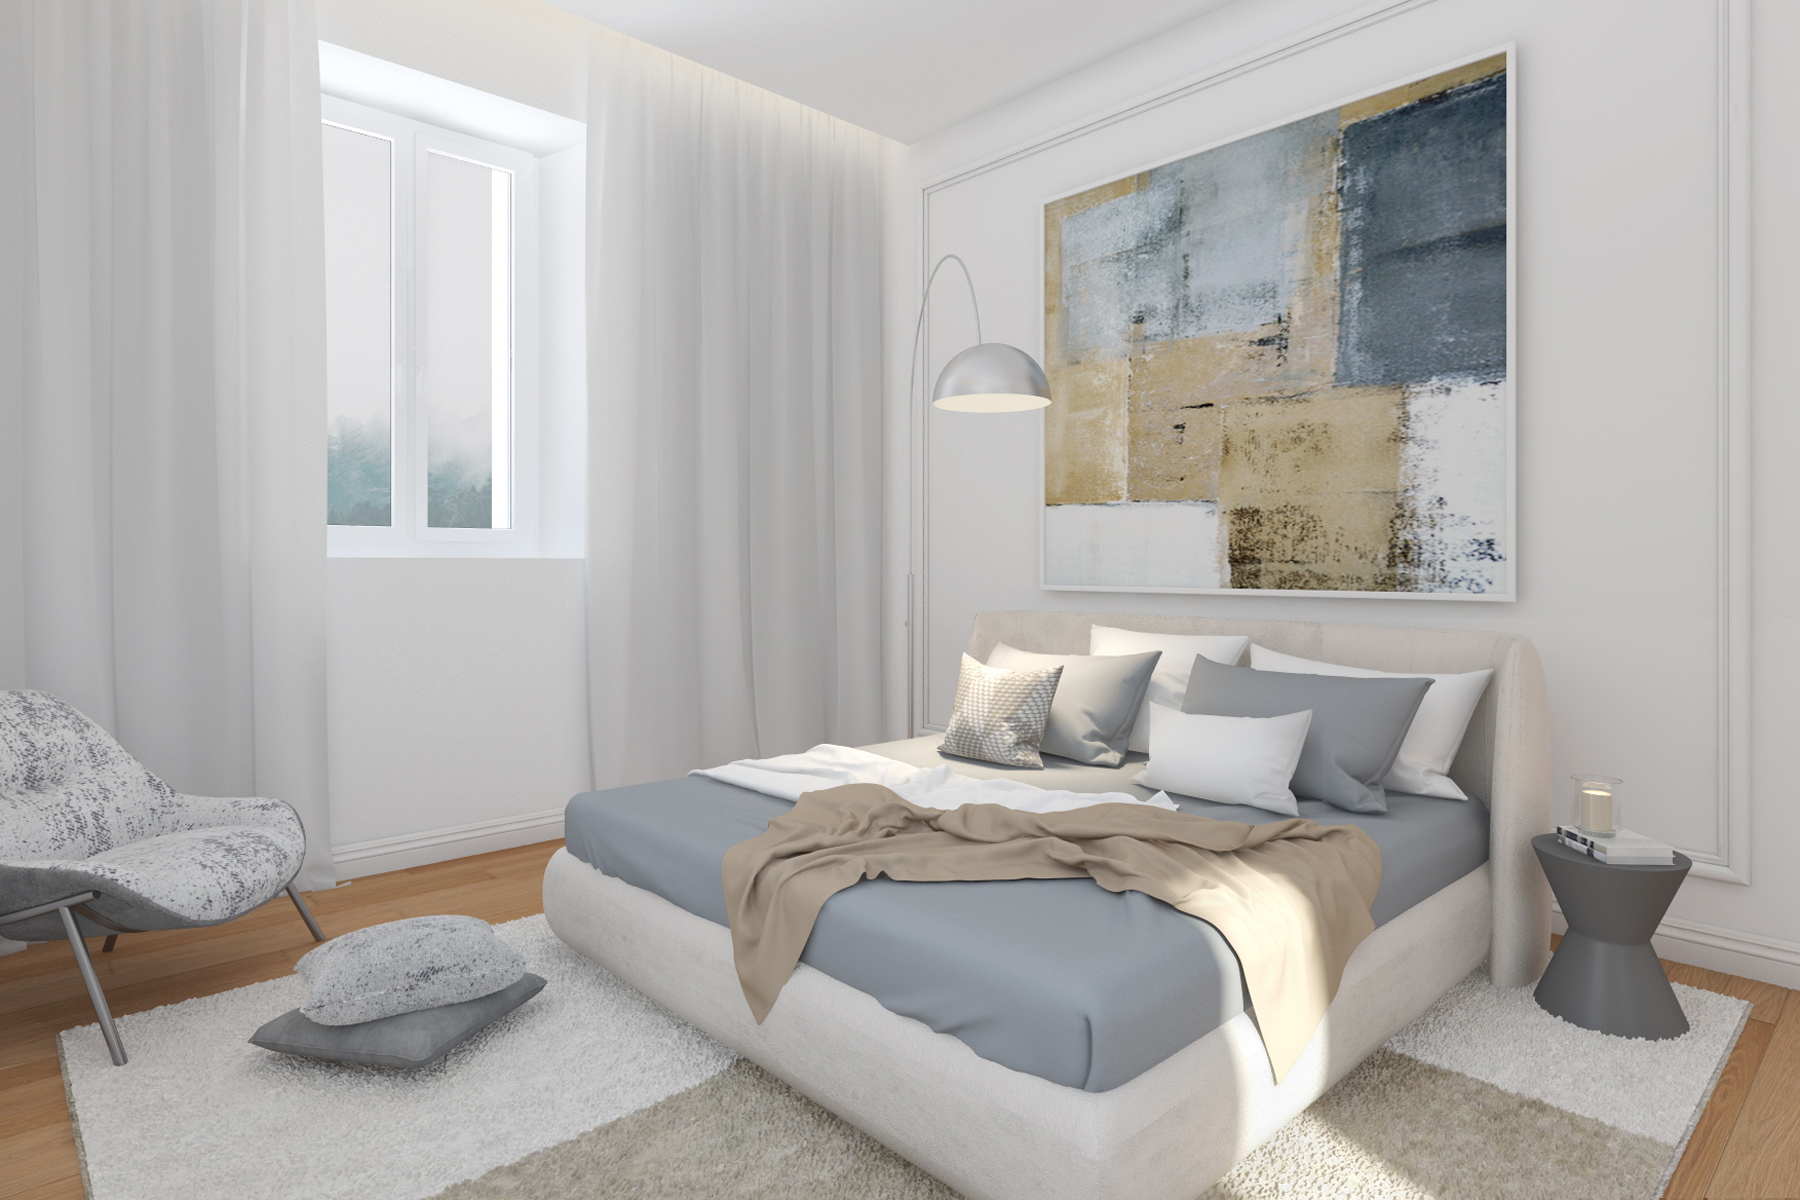 Additional photo for property listing at Semi-detached house on Lake Orta Pella, Novara Italy